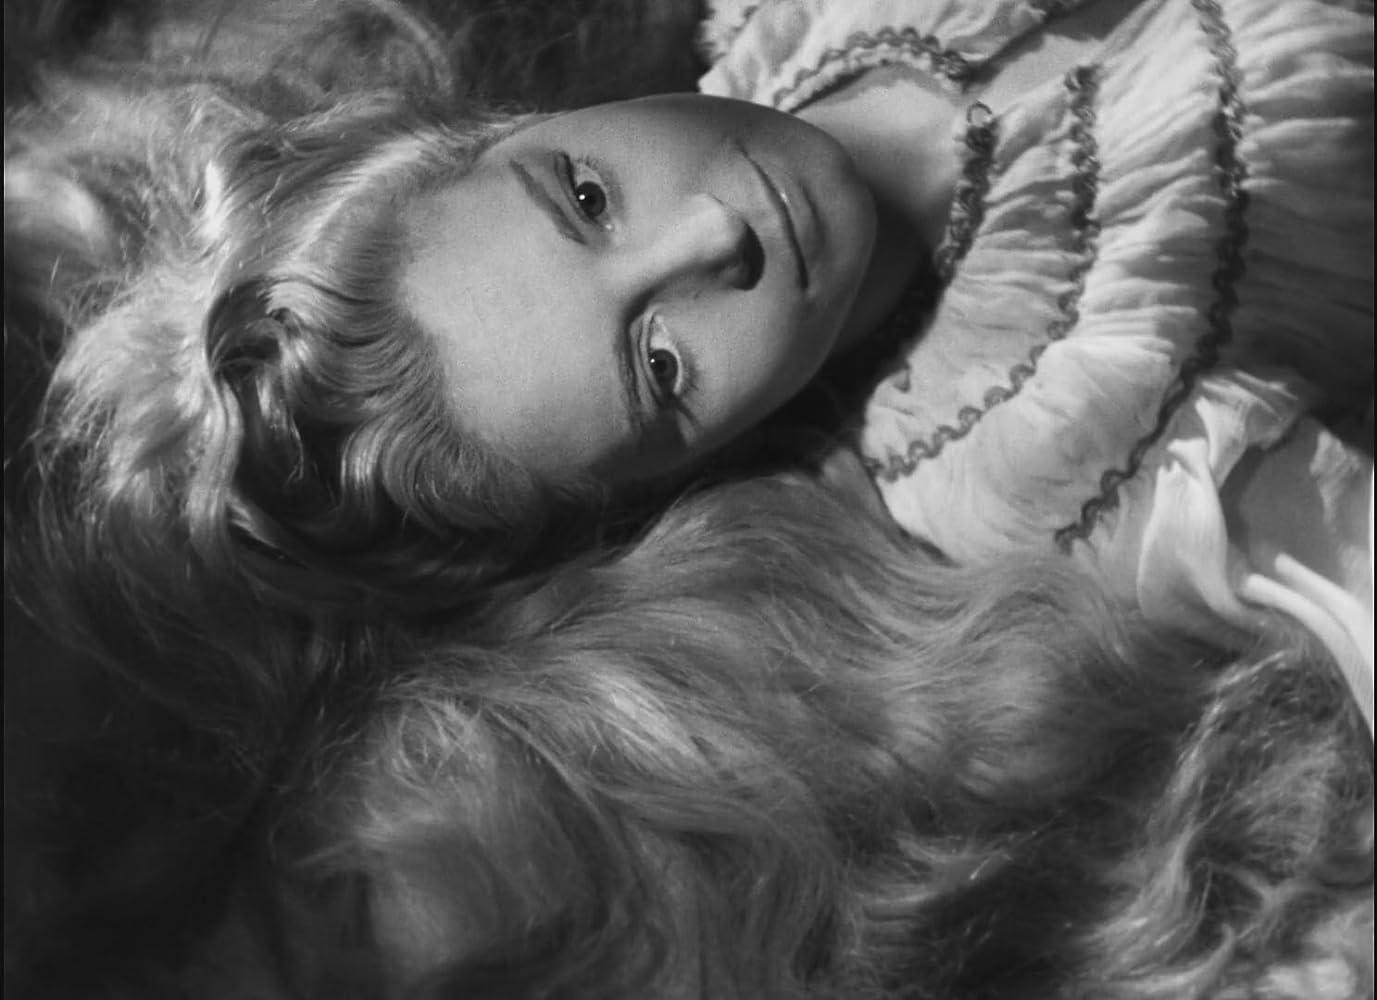 Klaudia Kovacs (director) Porn pics & movies Patricia Burke,Dana Wynter (1931-2011 (born in Berlin, Germany)